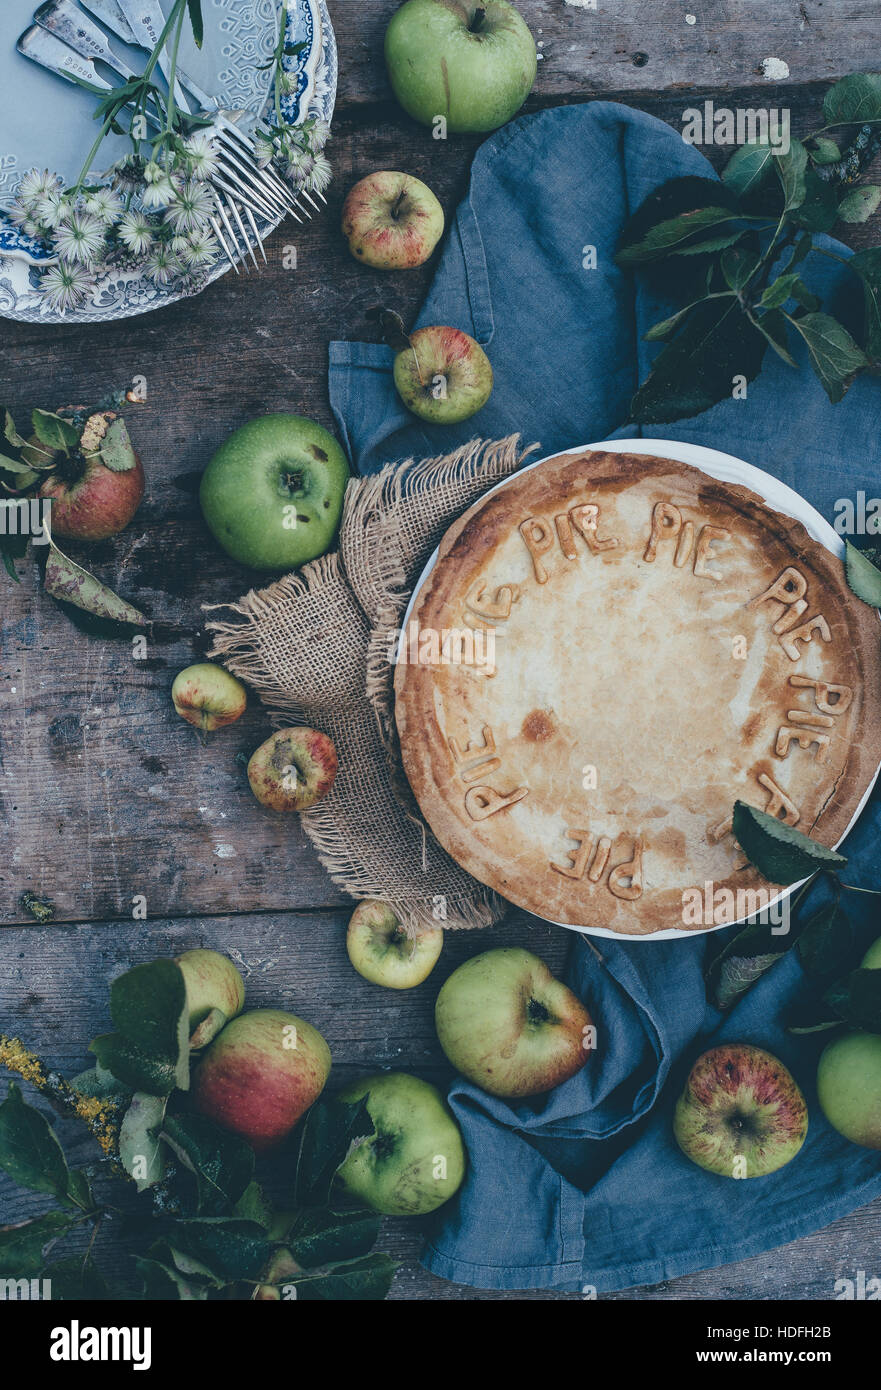 Home made apple pie - Stock Image